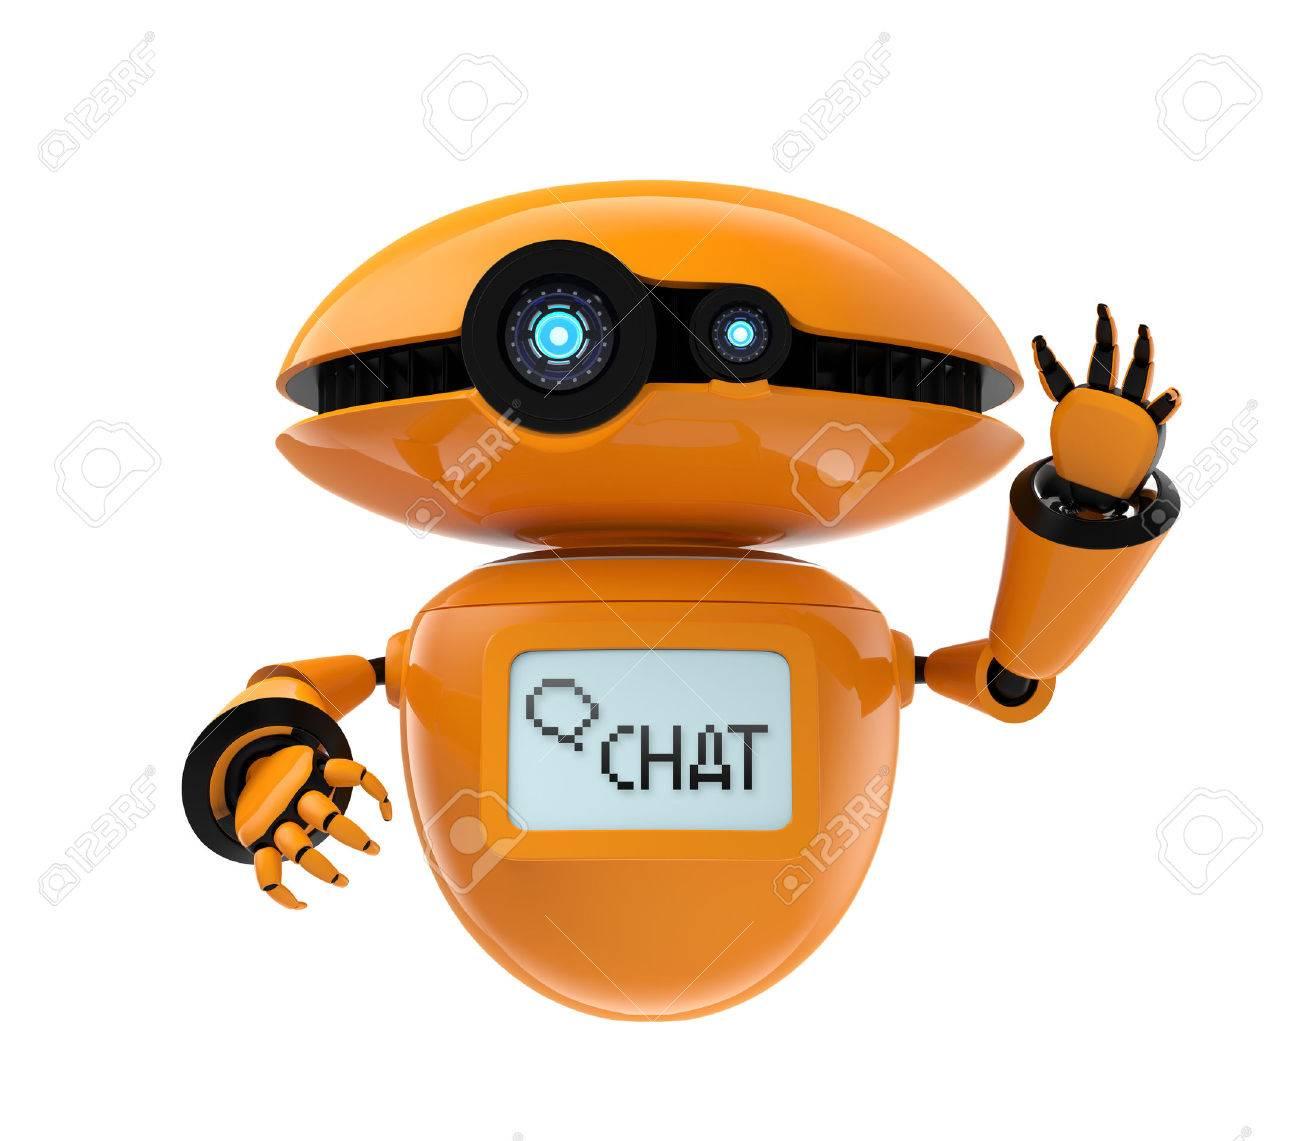 Orange robot isolated on white background. 3D rendering image - 62495773